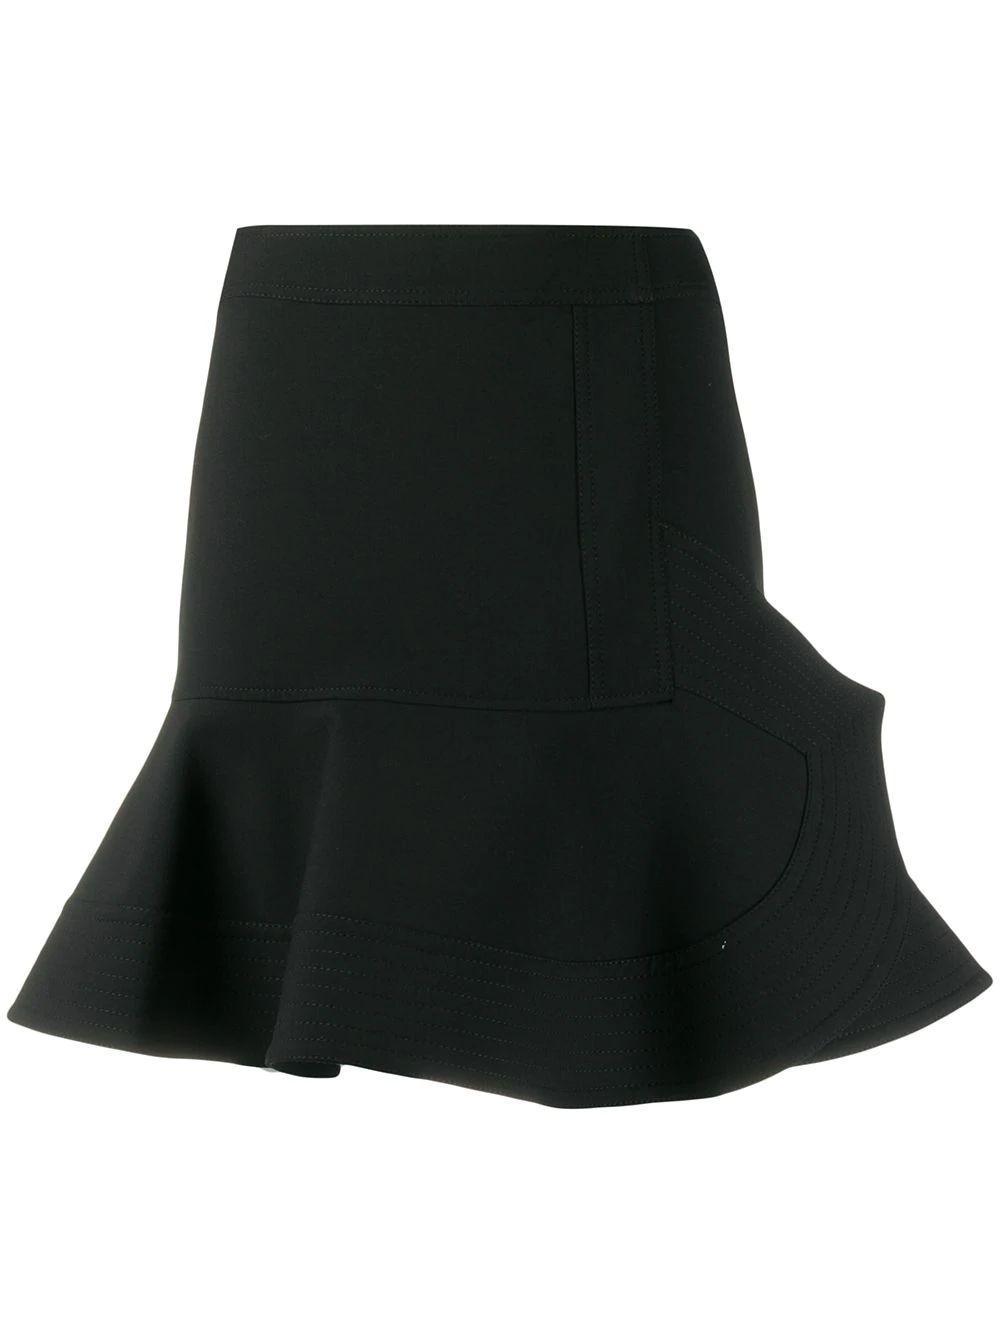 Peplum Hem Skirt Item # 2120WSK000495A